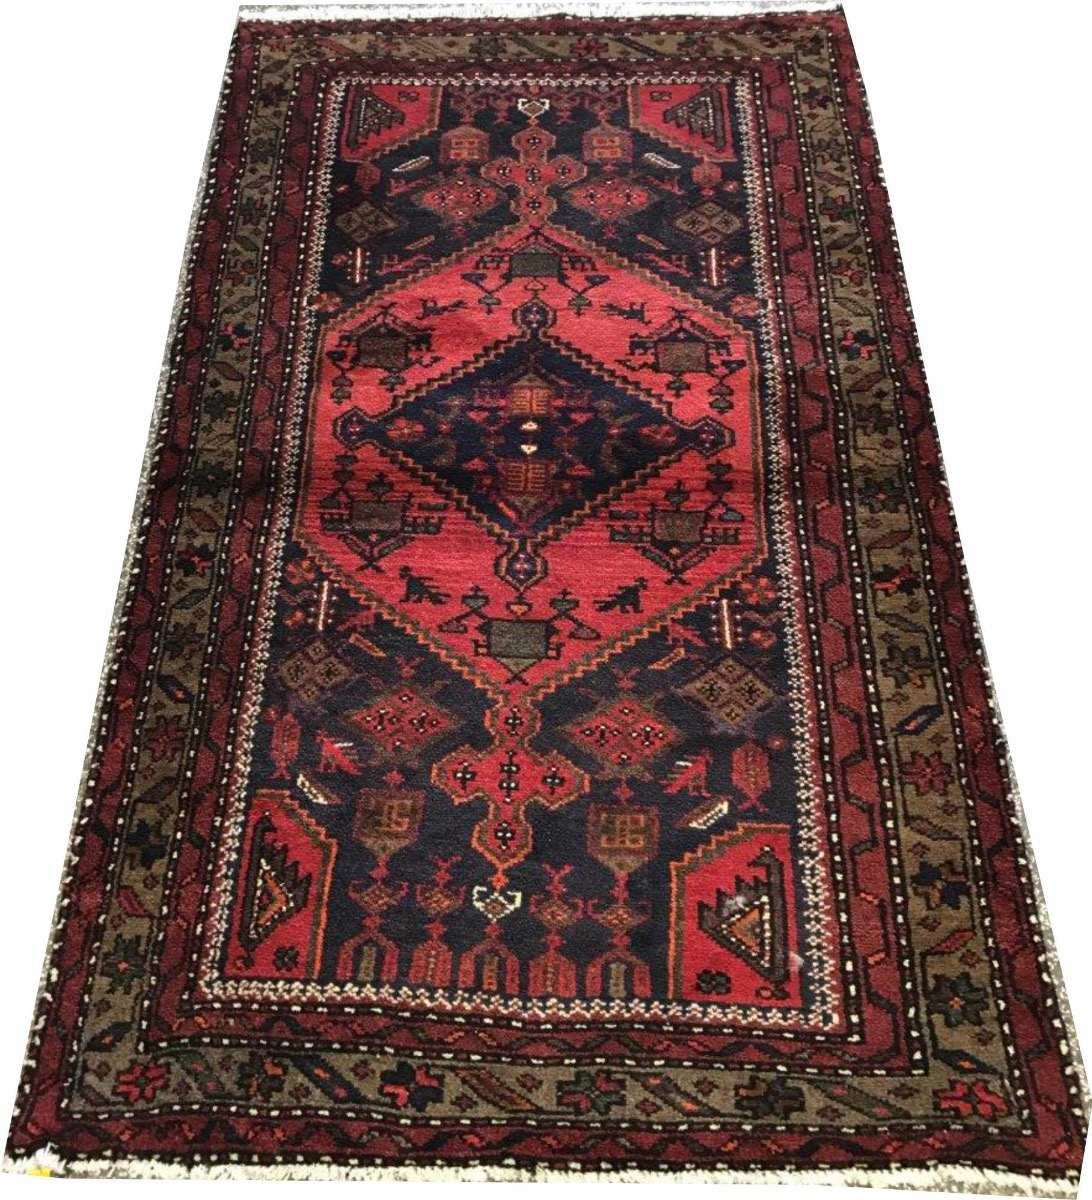 Hamadan 158x95cm Handmade Tapete Persa Rustico 1.5x1m